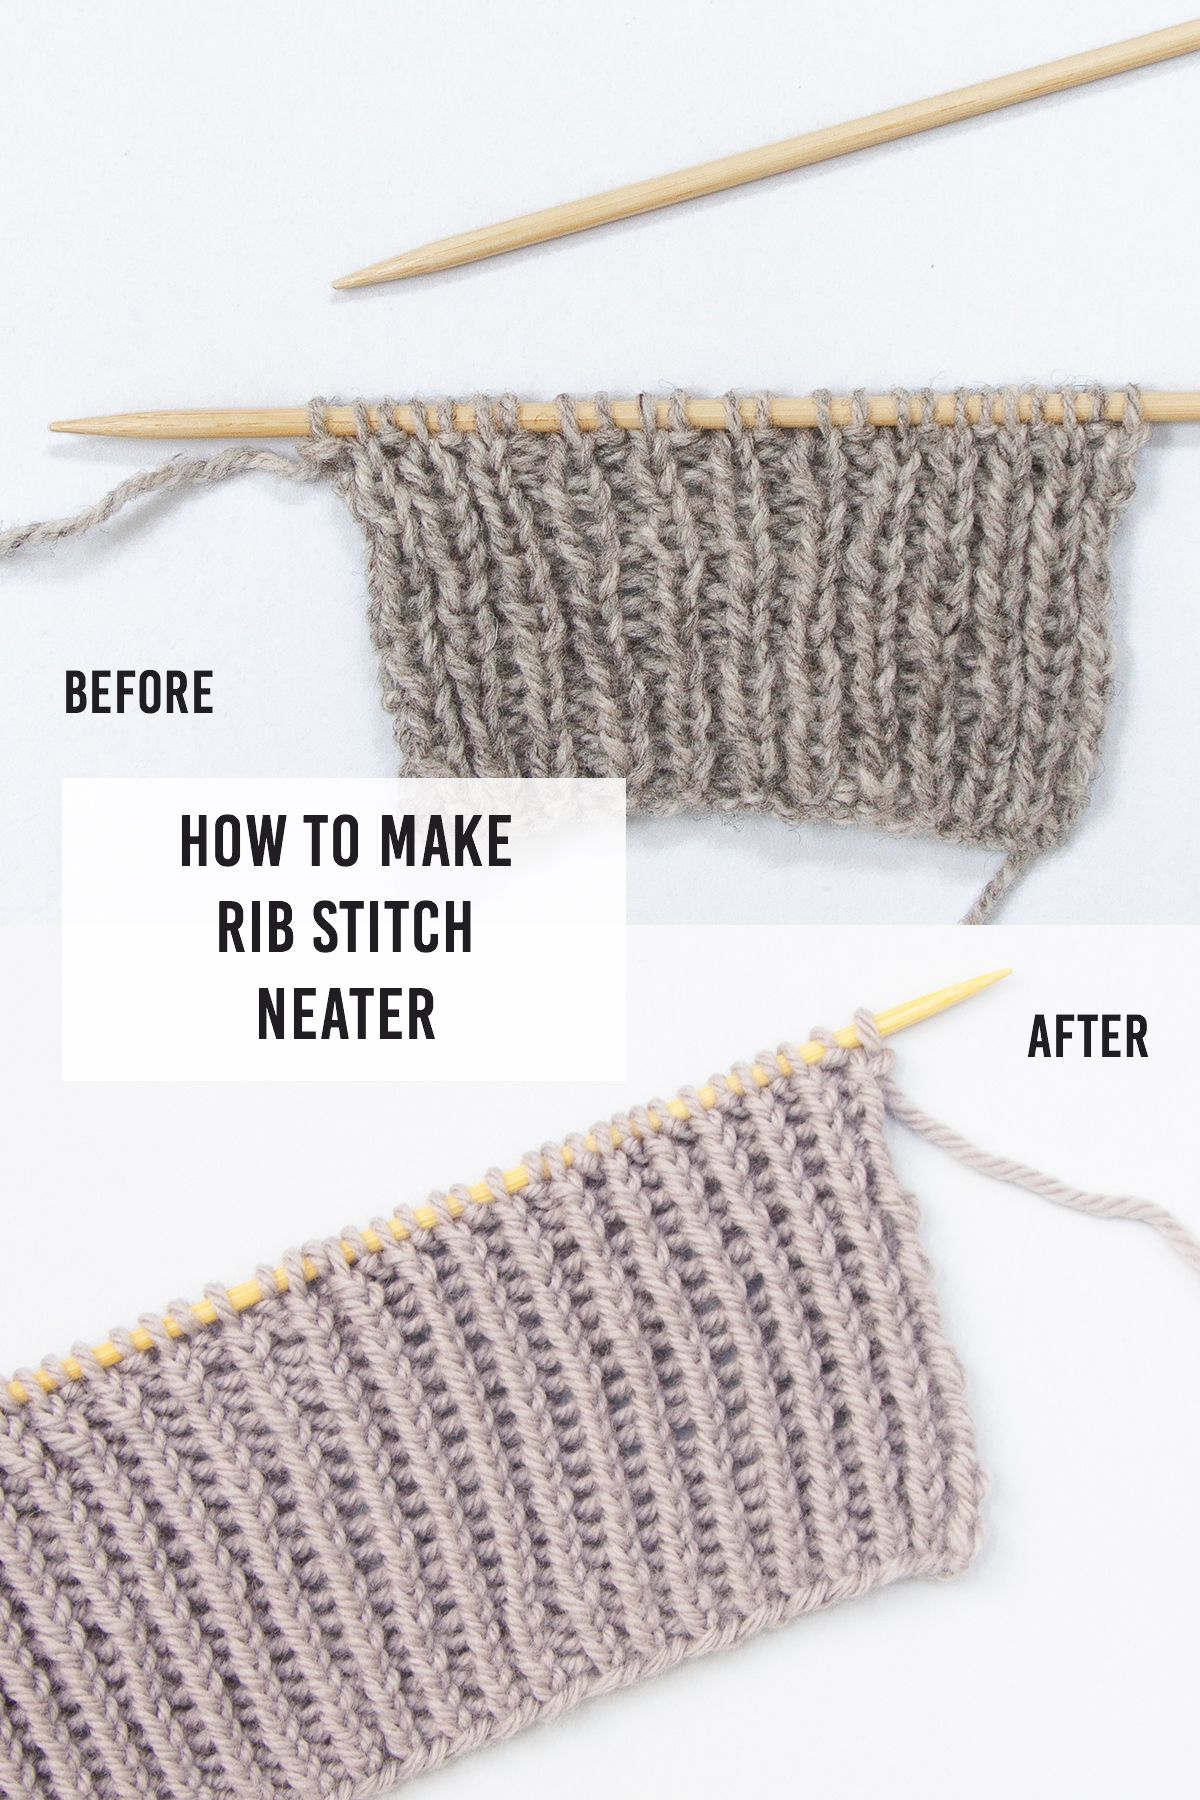 How To Make Rib Stitch Neater: Twisted Rib Stitch — Button and Blue